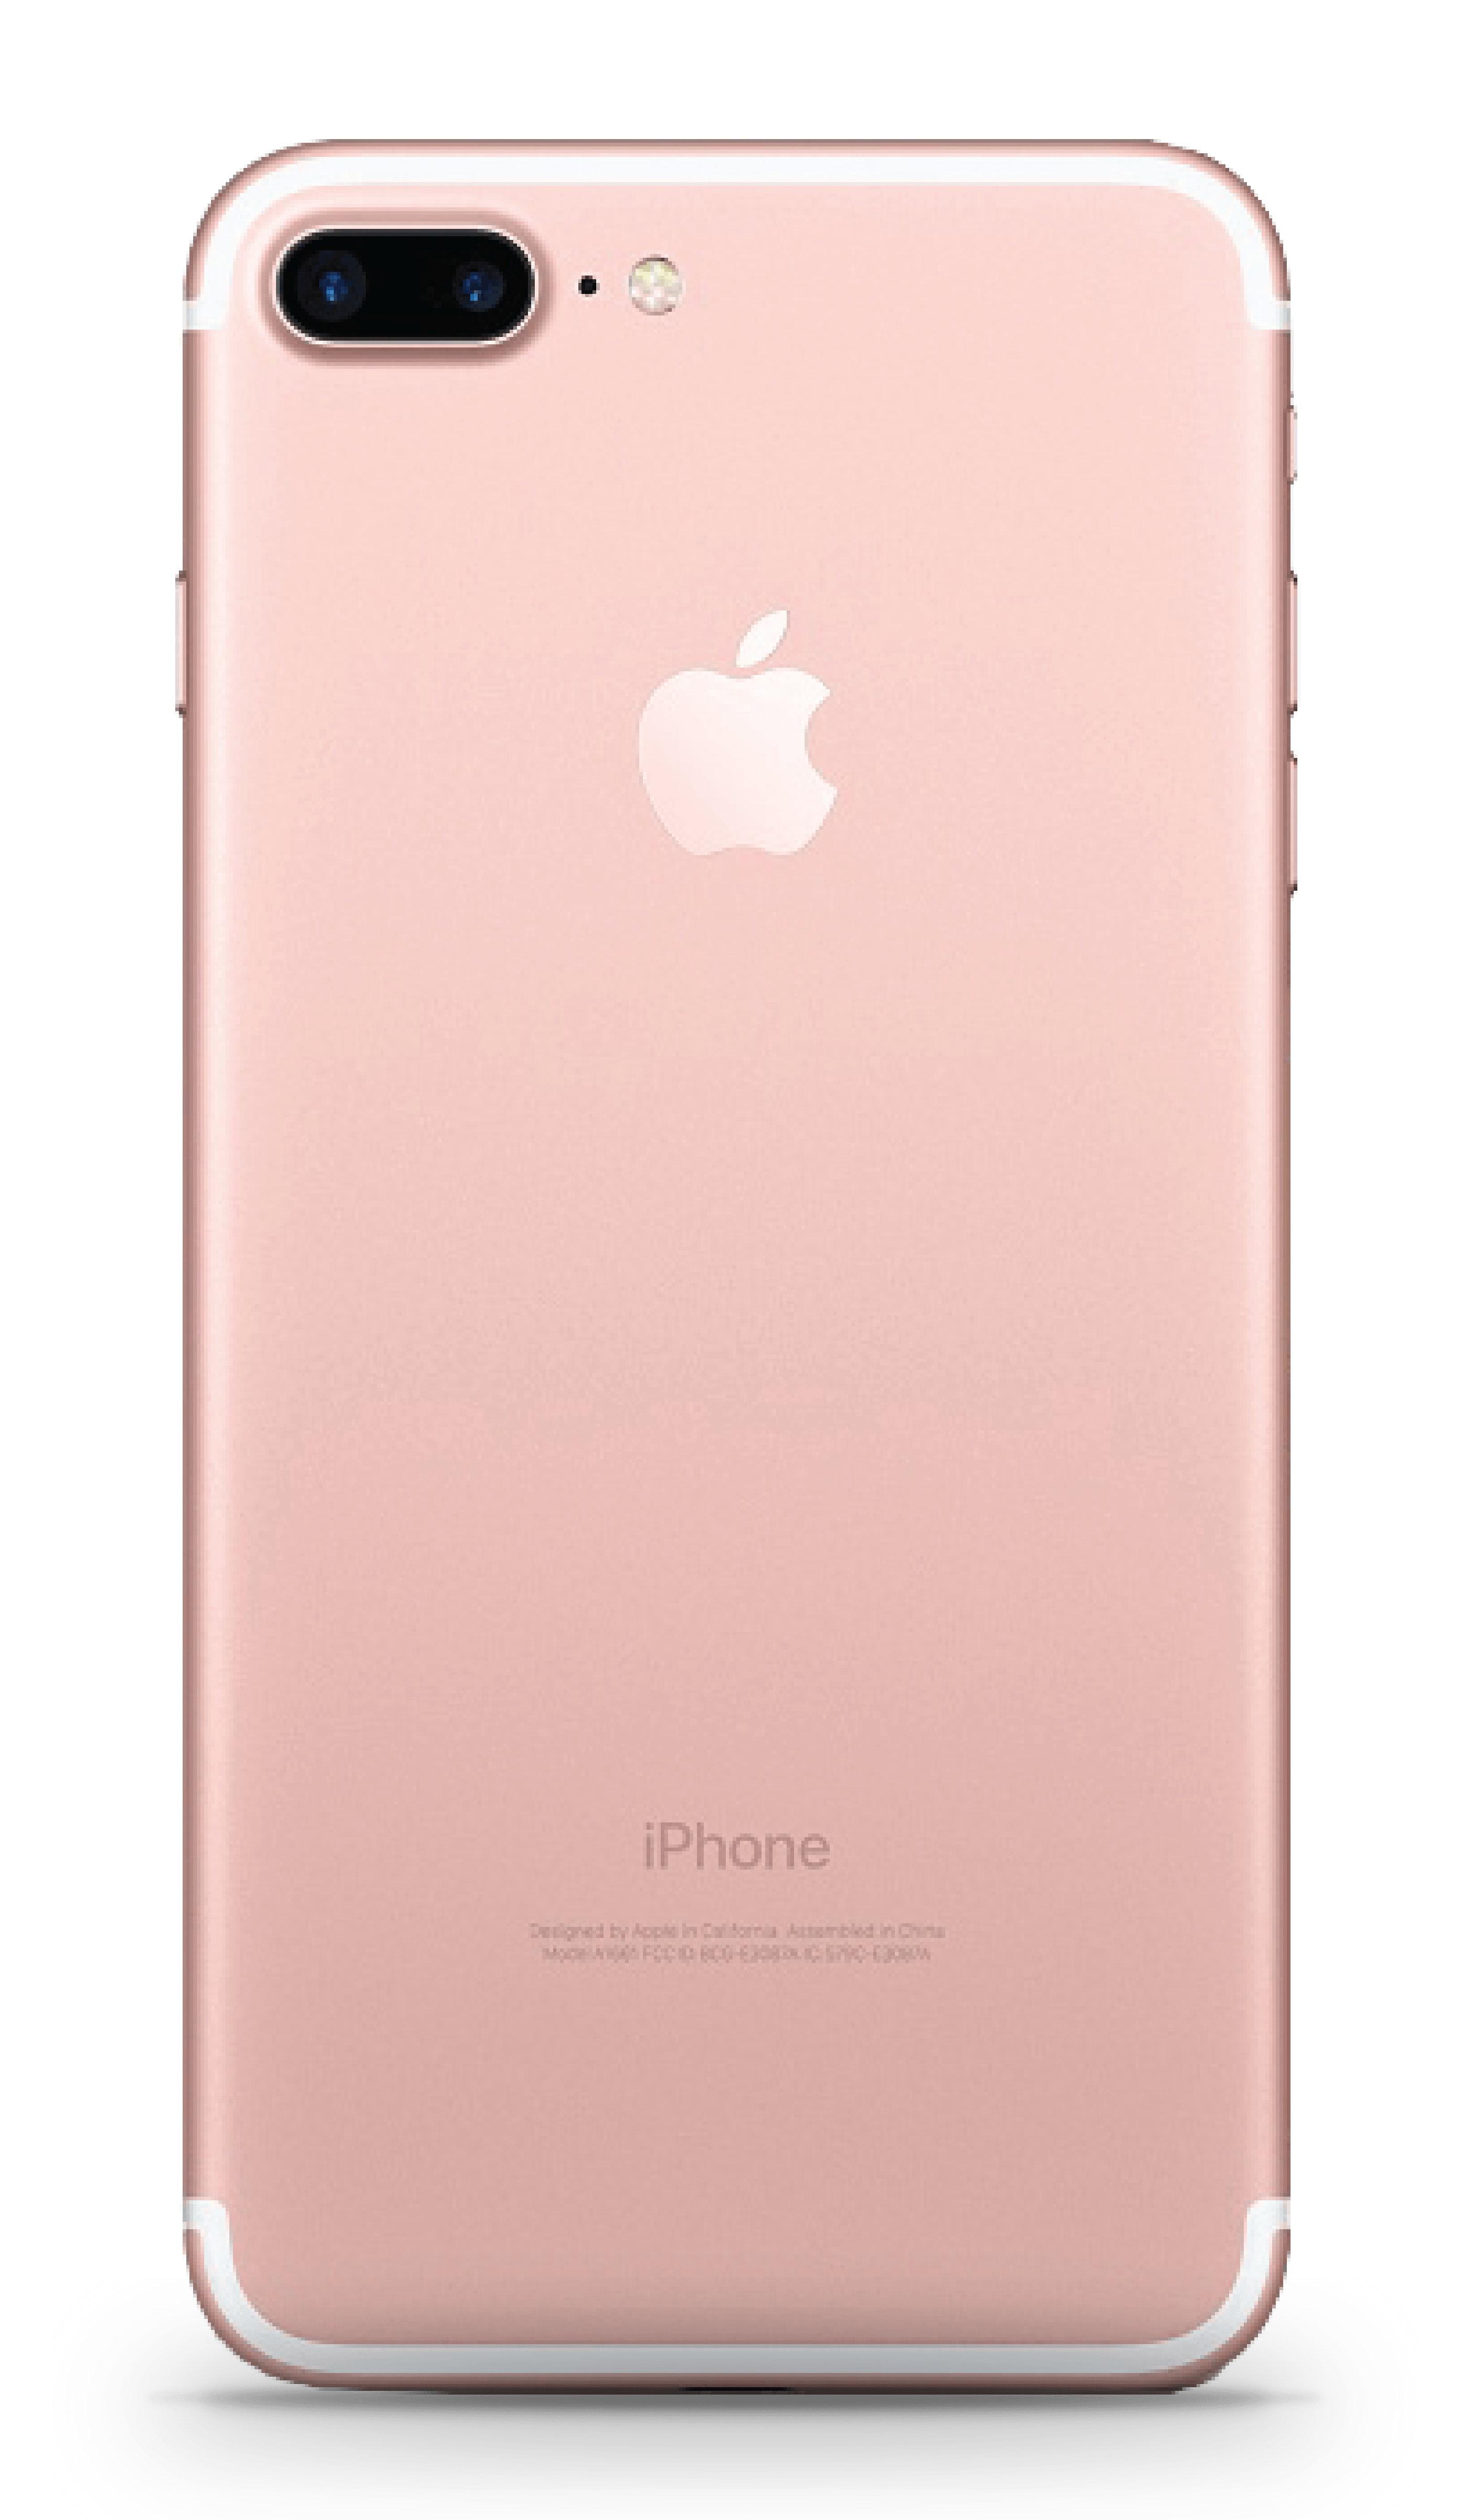 Apple iPhone 7 plus image